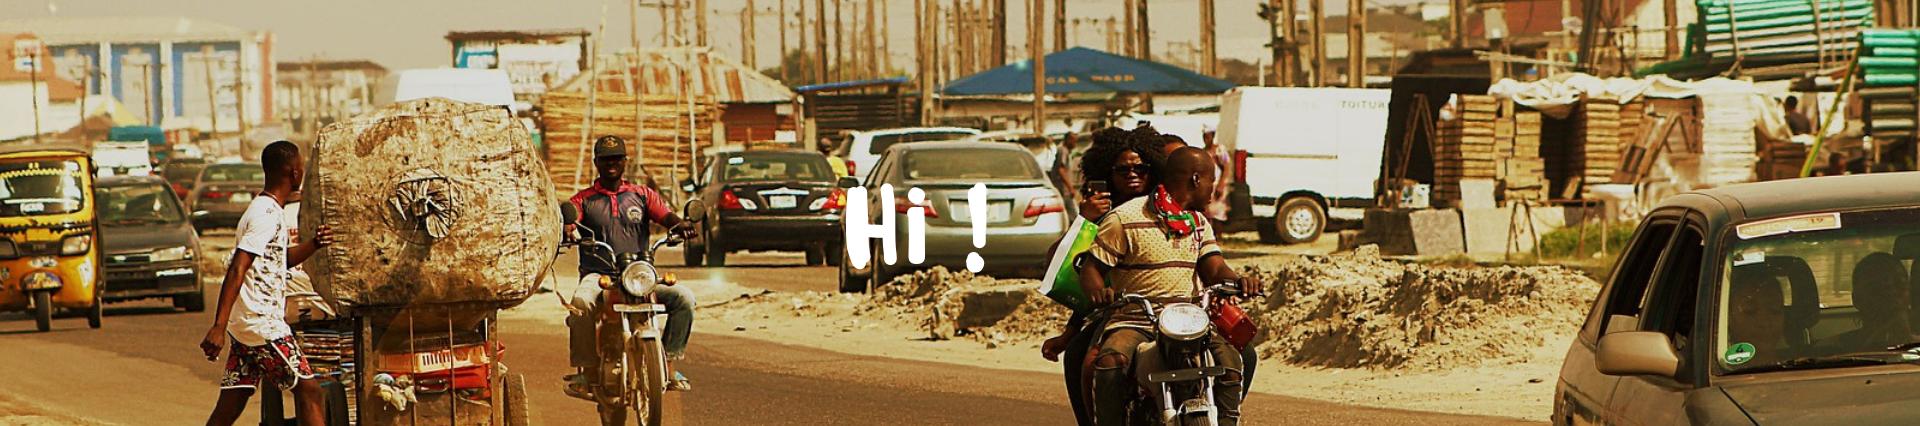 how-to-send-a-parcel-to-nigeria